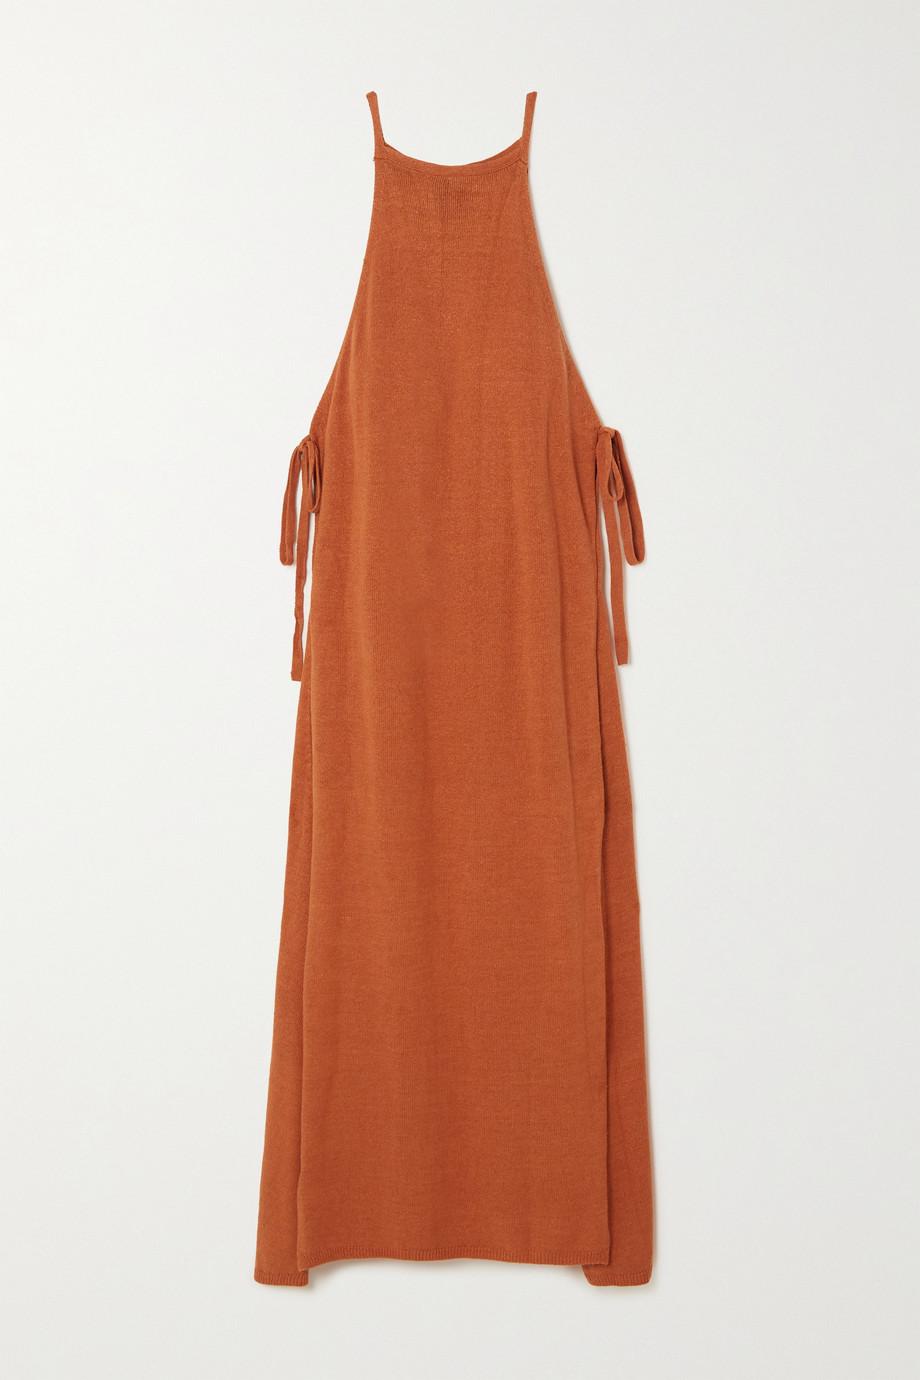 Cult Gaia Remi convertible linen-blend maxi dress